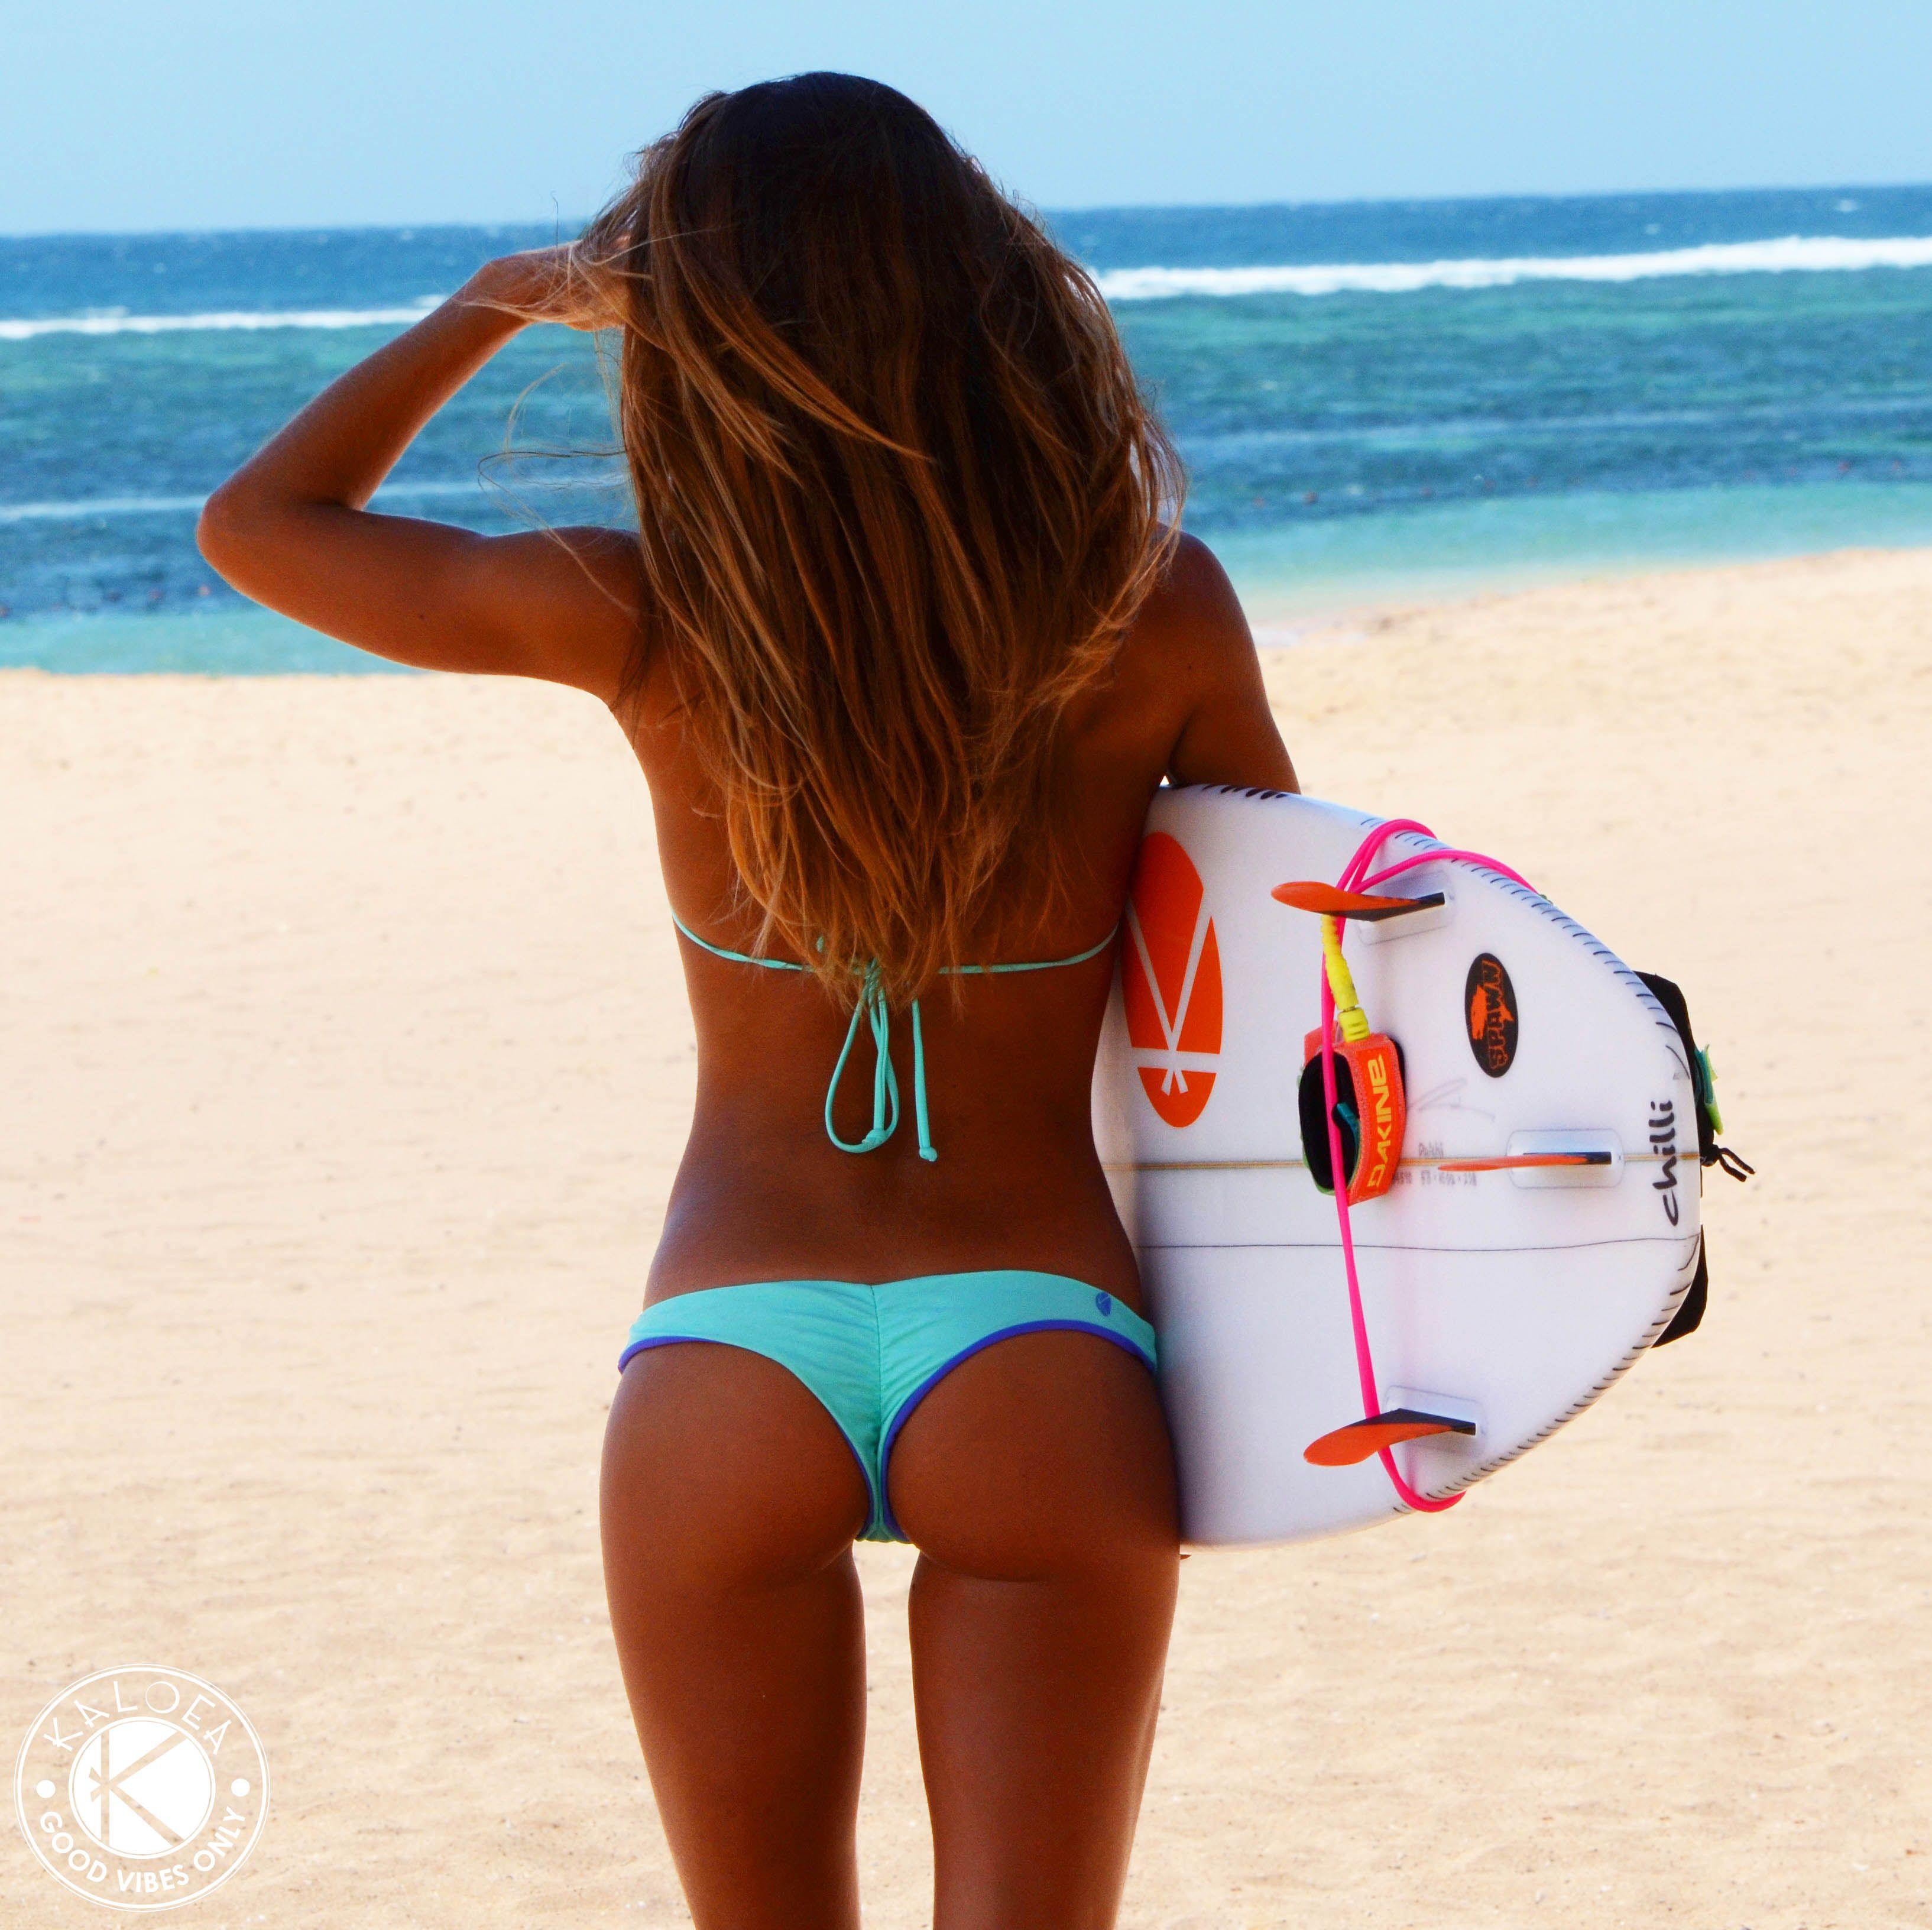 surfer girl bikinis